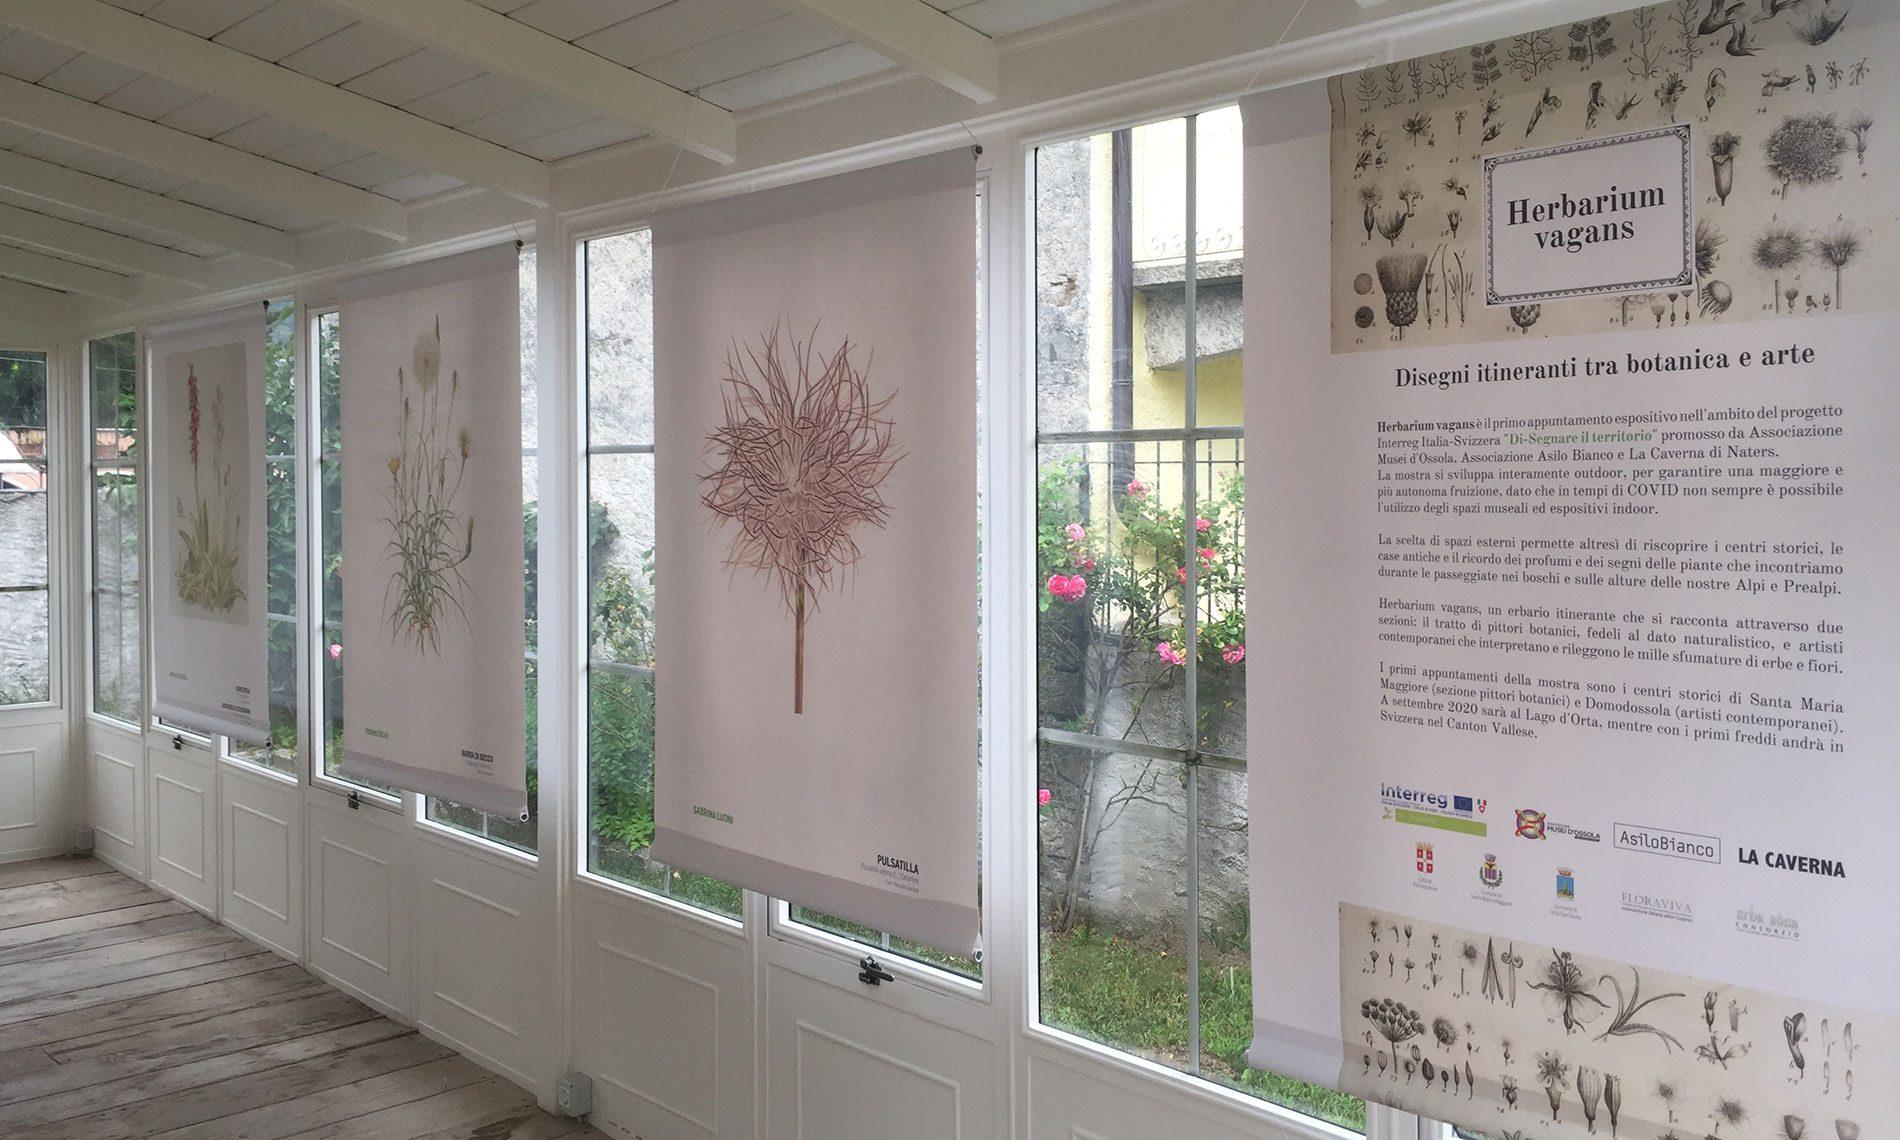 La mostra Herbarium vagans alla Casa del Profumo a Santa Maria Maggiore